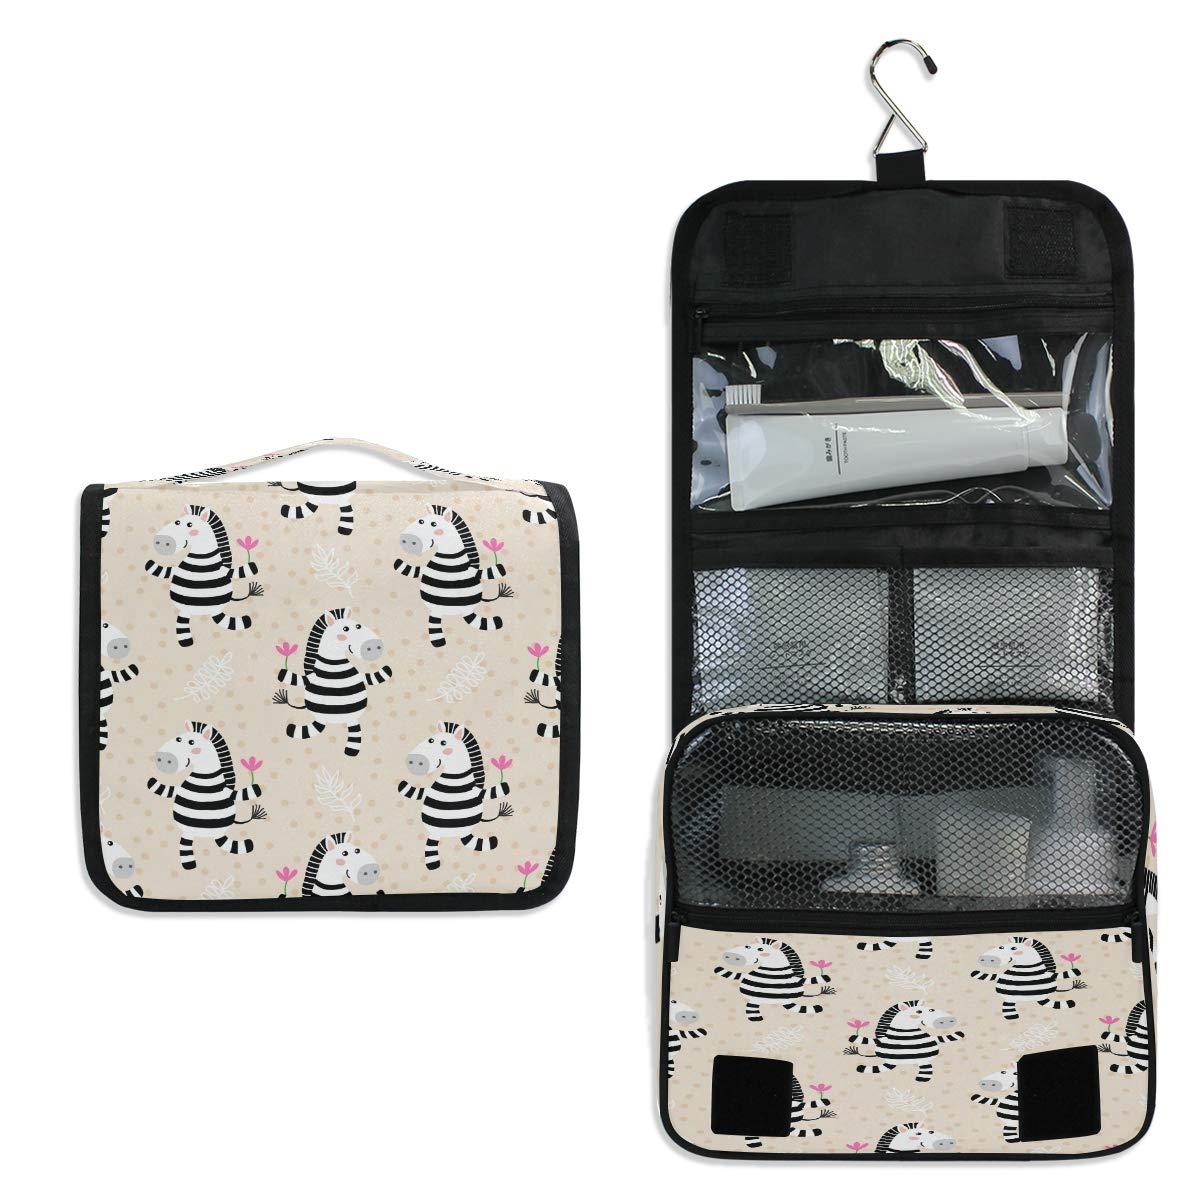 CCDMJ Hanging Toiletry Bag Cute Animal Zebra Floral Cosmetics Makeup Bags with Hook Portable Multifunction Travel bag Wash Bathroom Organizer for Women Girls